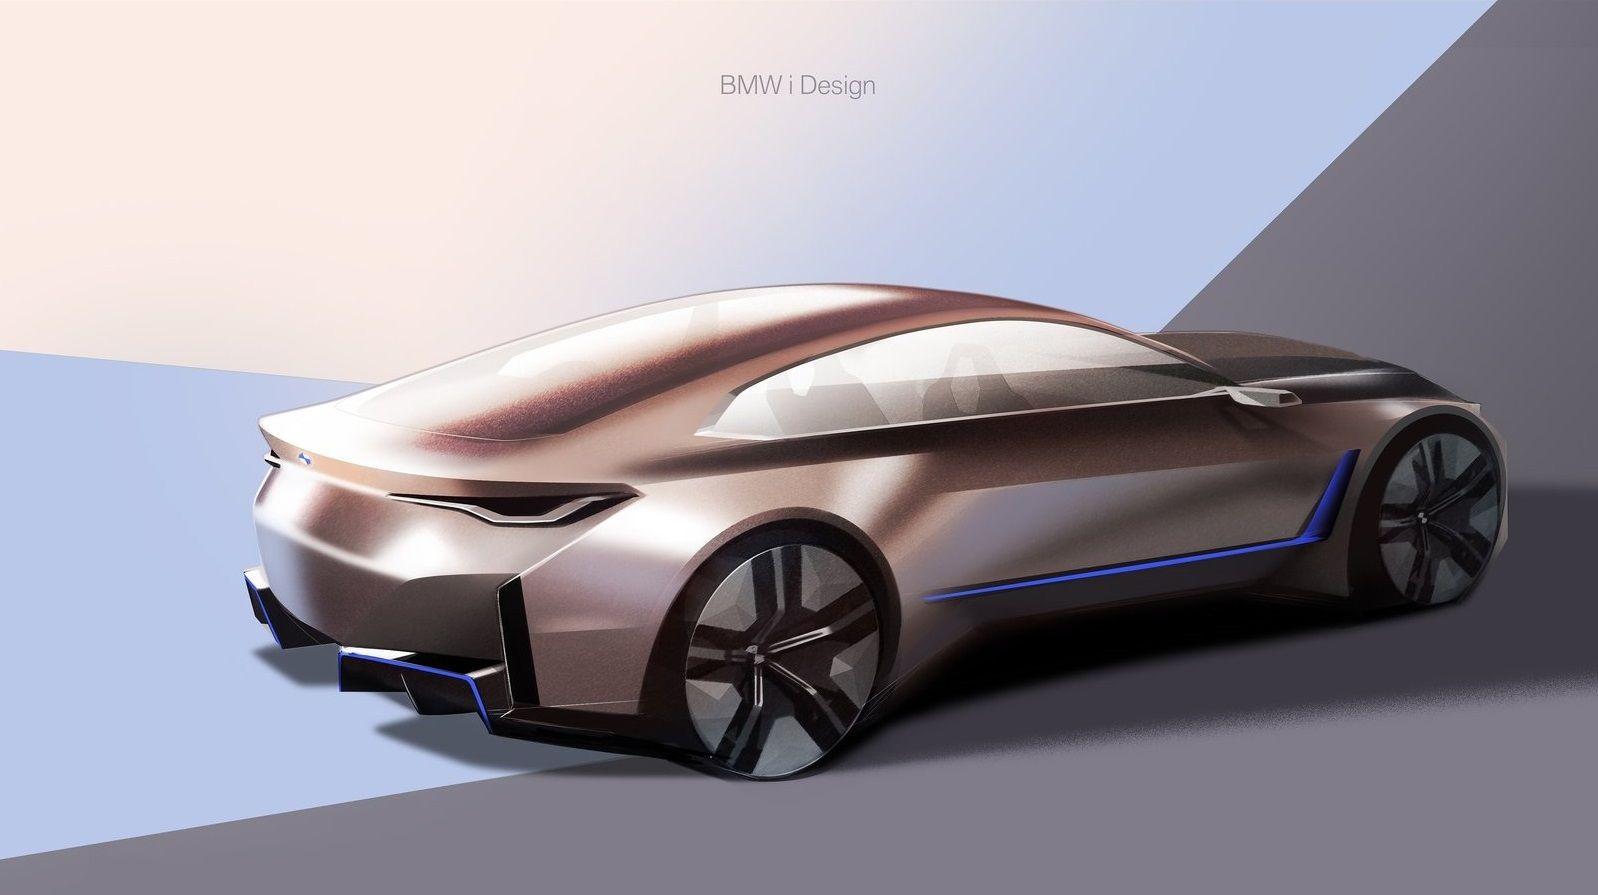 2020 Bmw I4 Concept In 2020 Bmw Design Bmw Concept Bmw